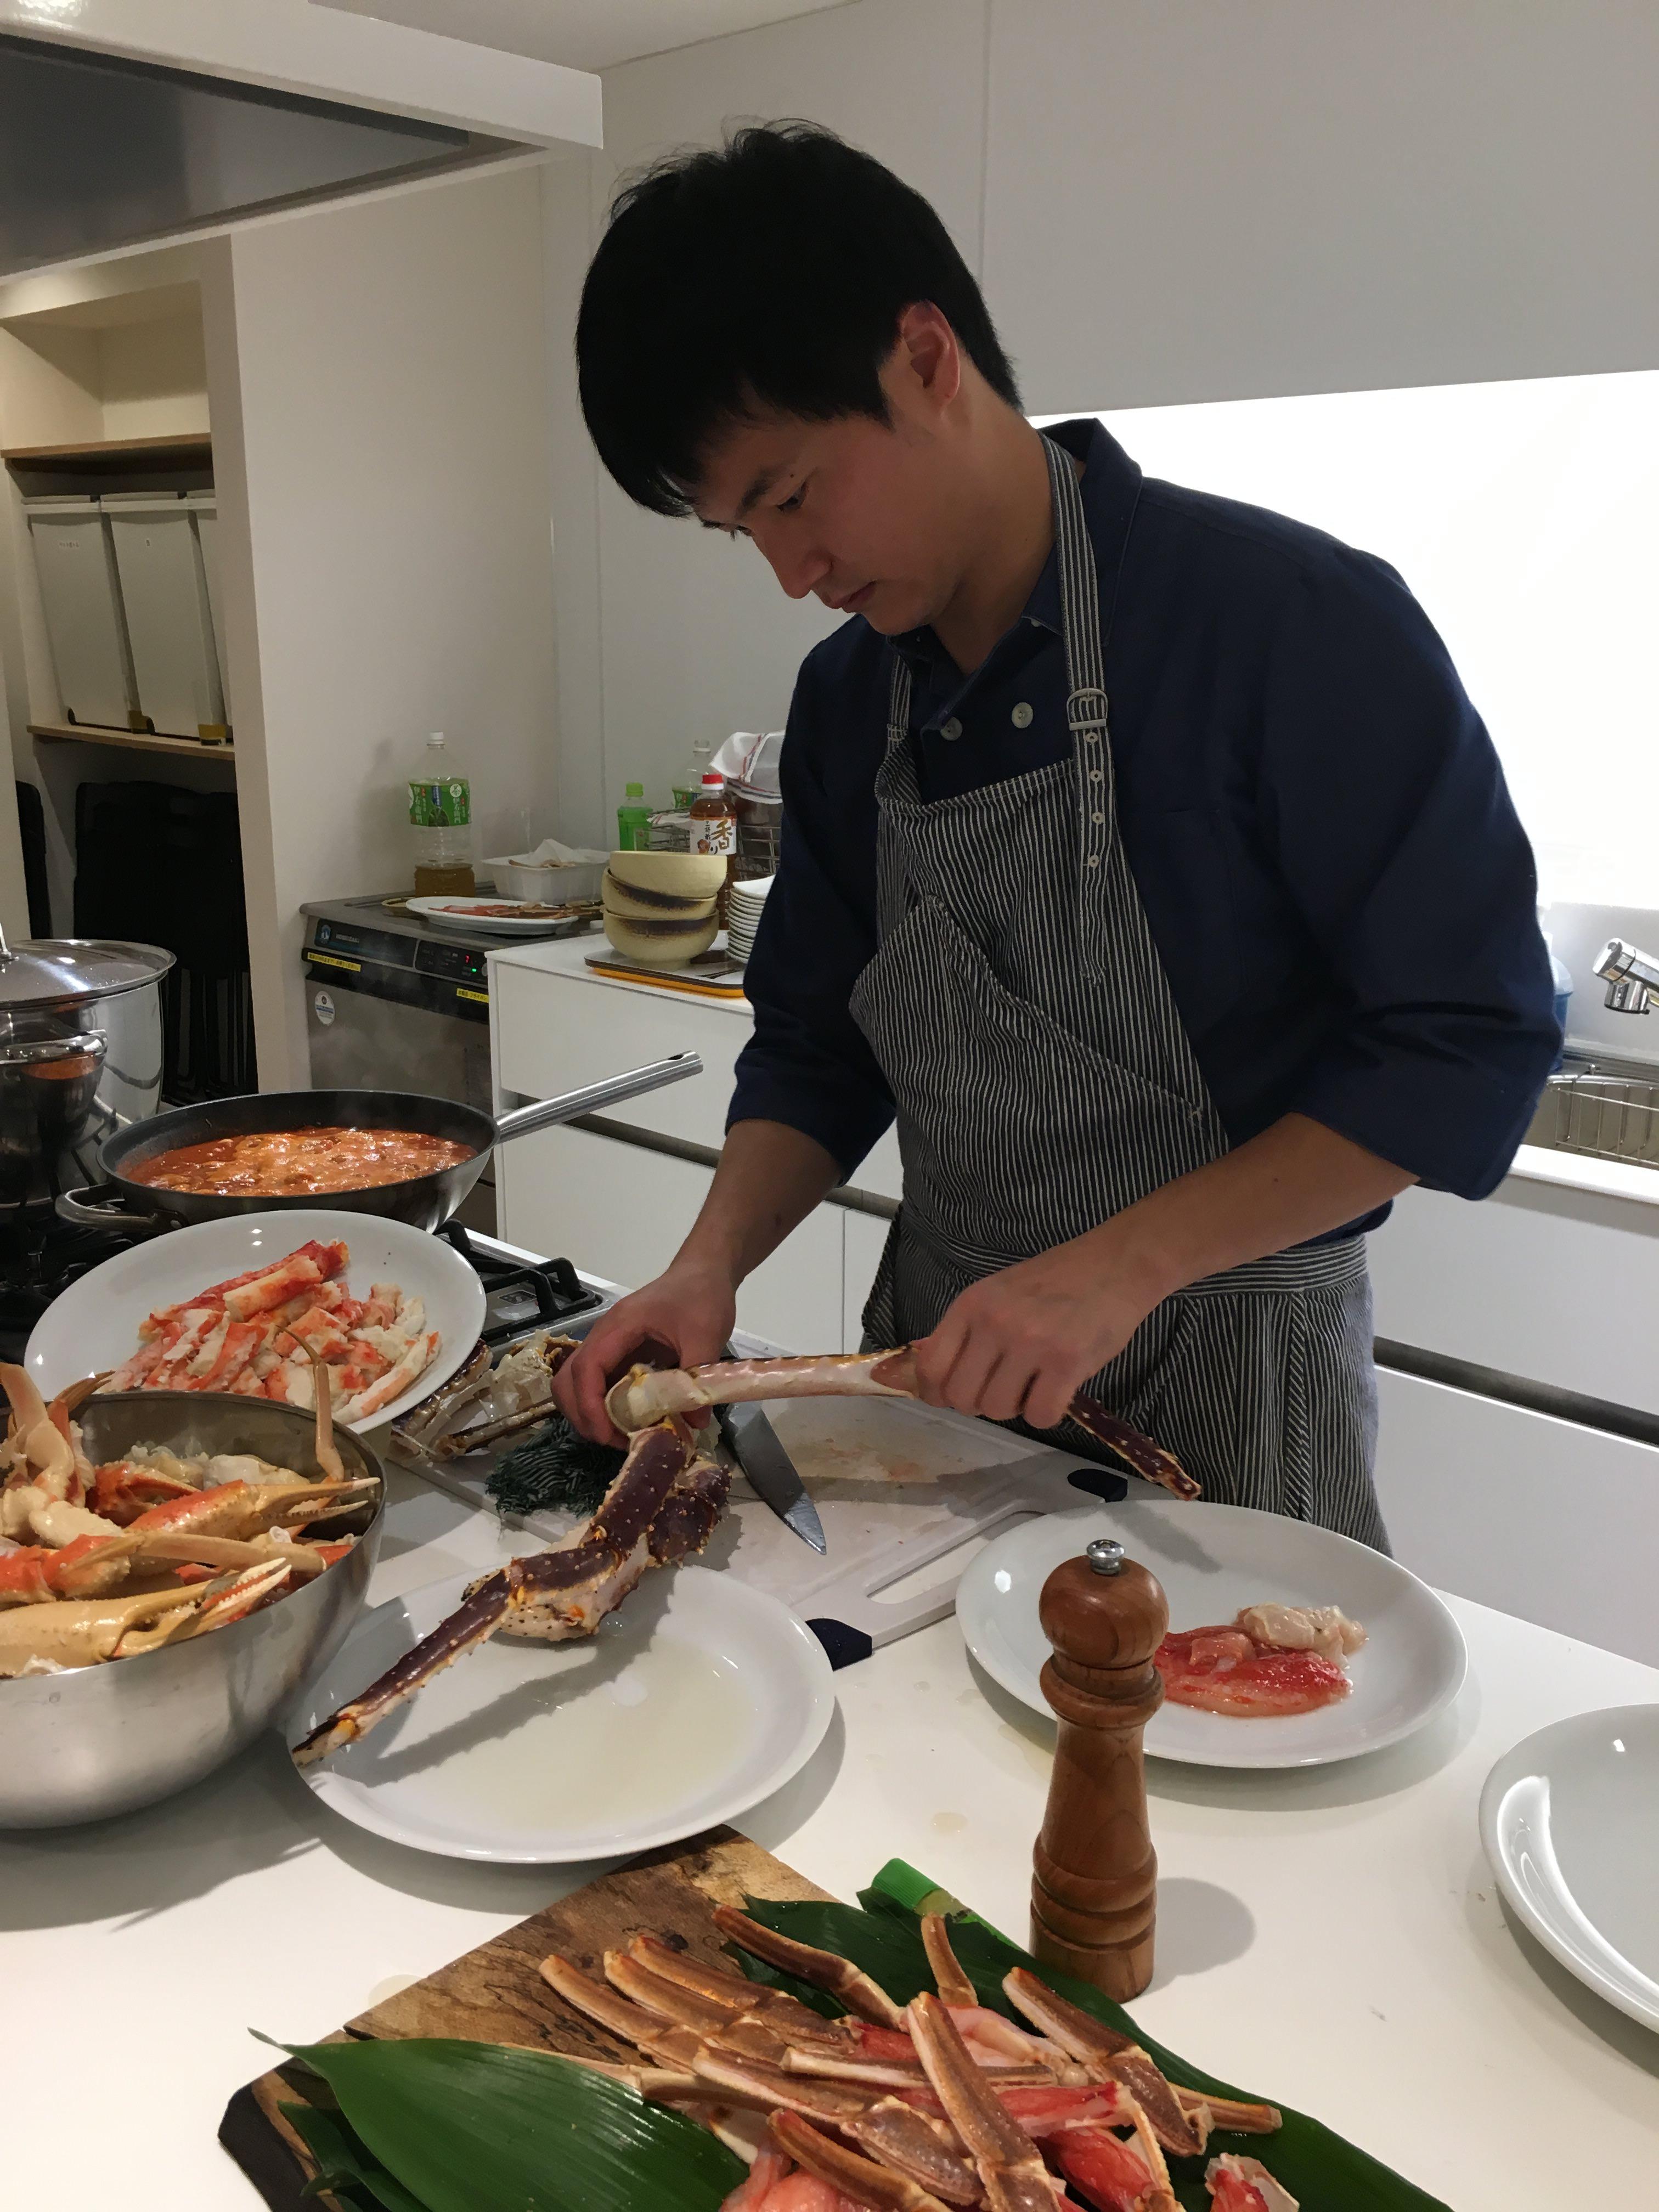 PRIME CHEF(プライムシェフ)| 試食会へのお料理提供